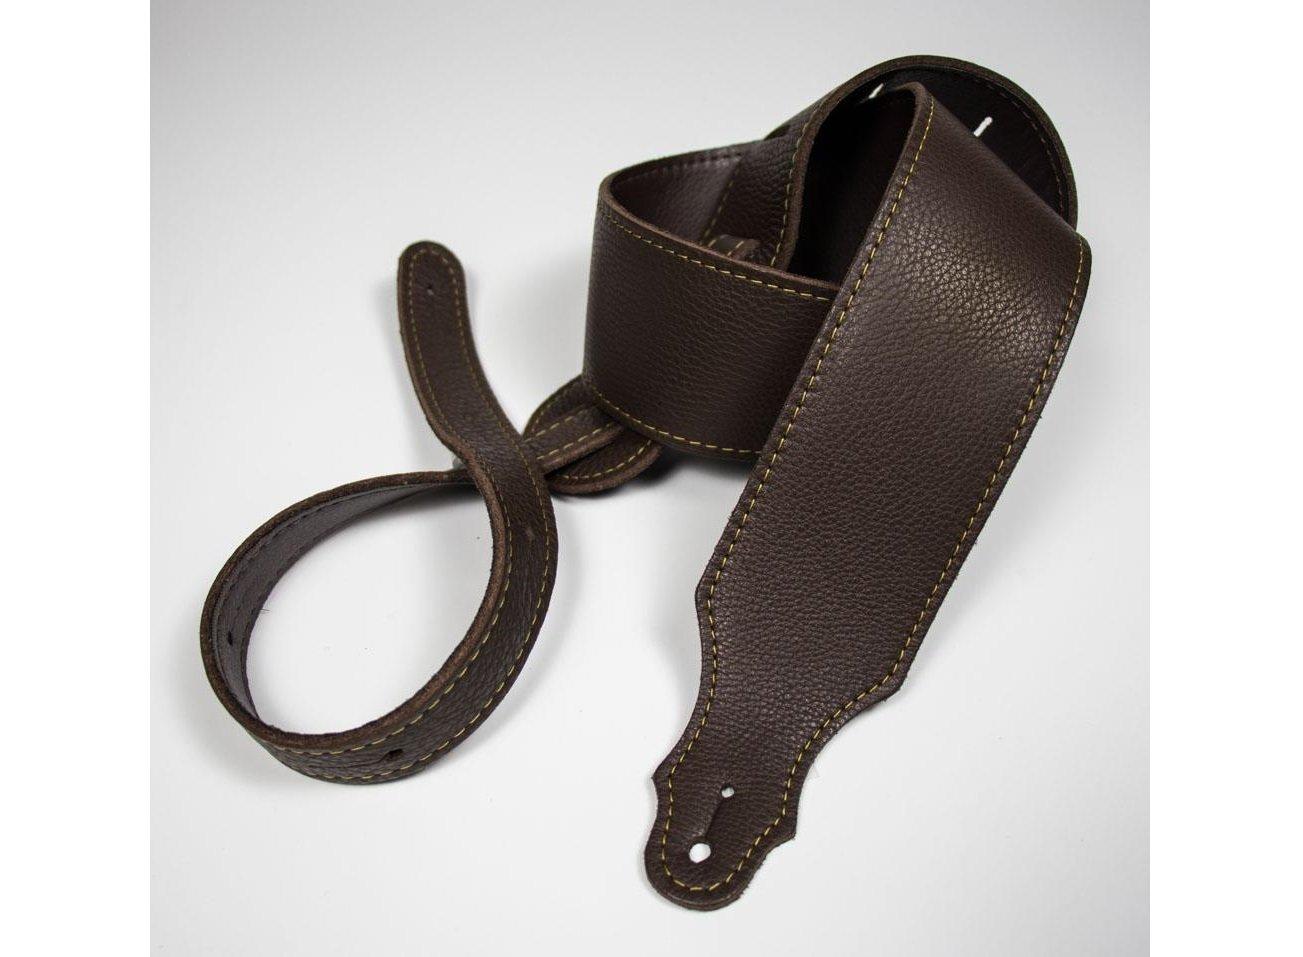 Franklin 2.5 Purist Chocolate Glove Leather Guitar Strap, Gold Stitching